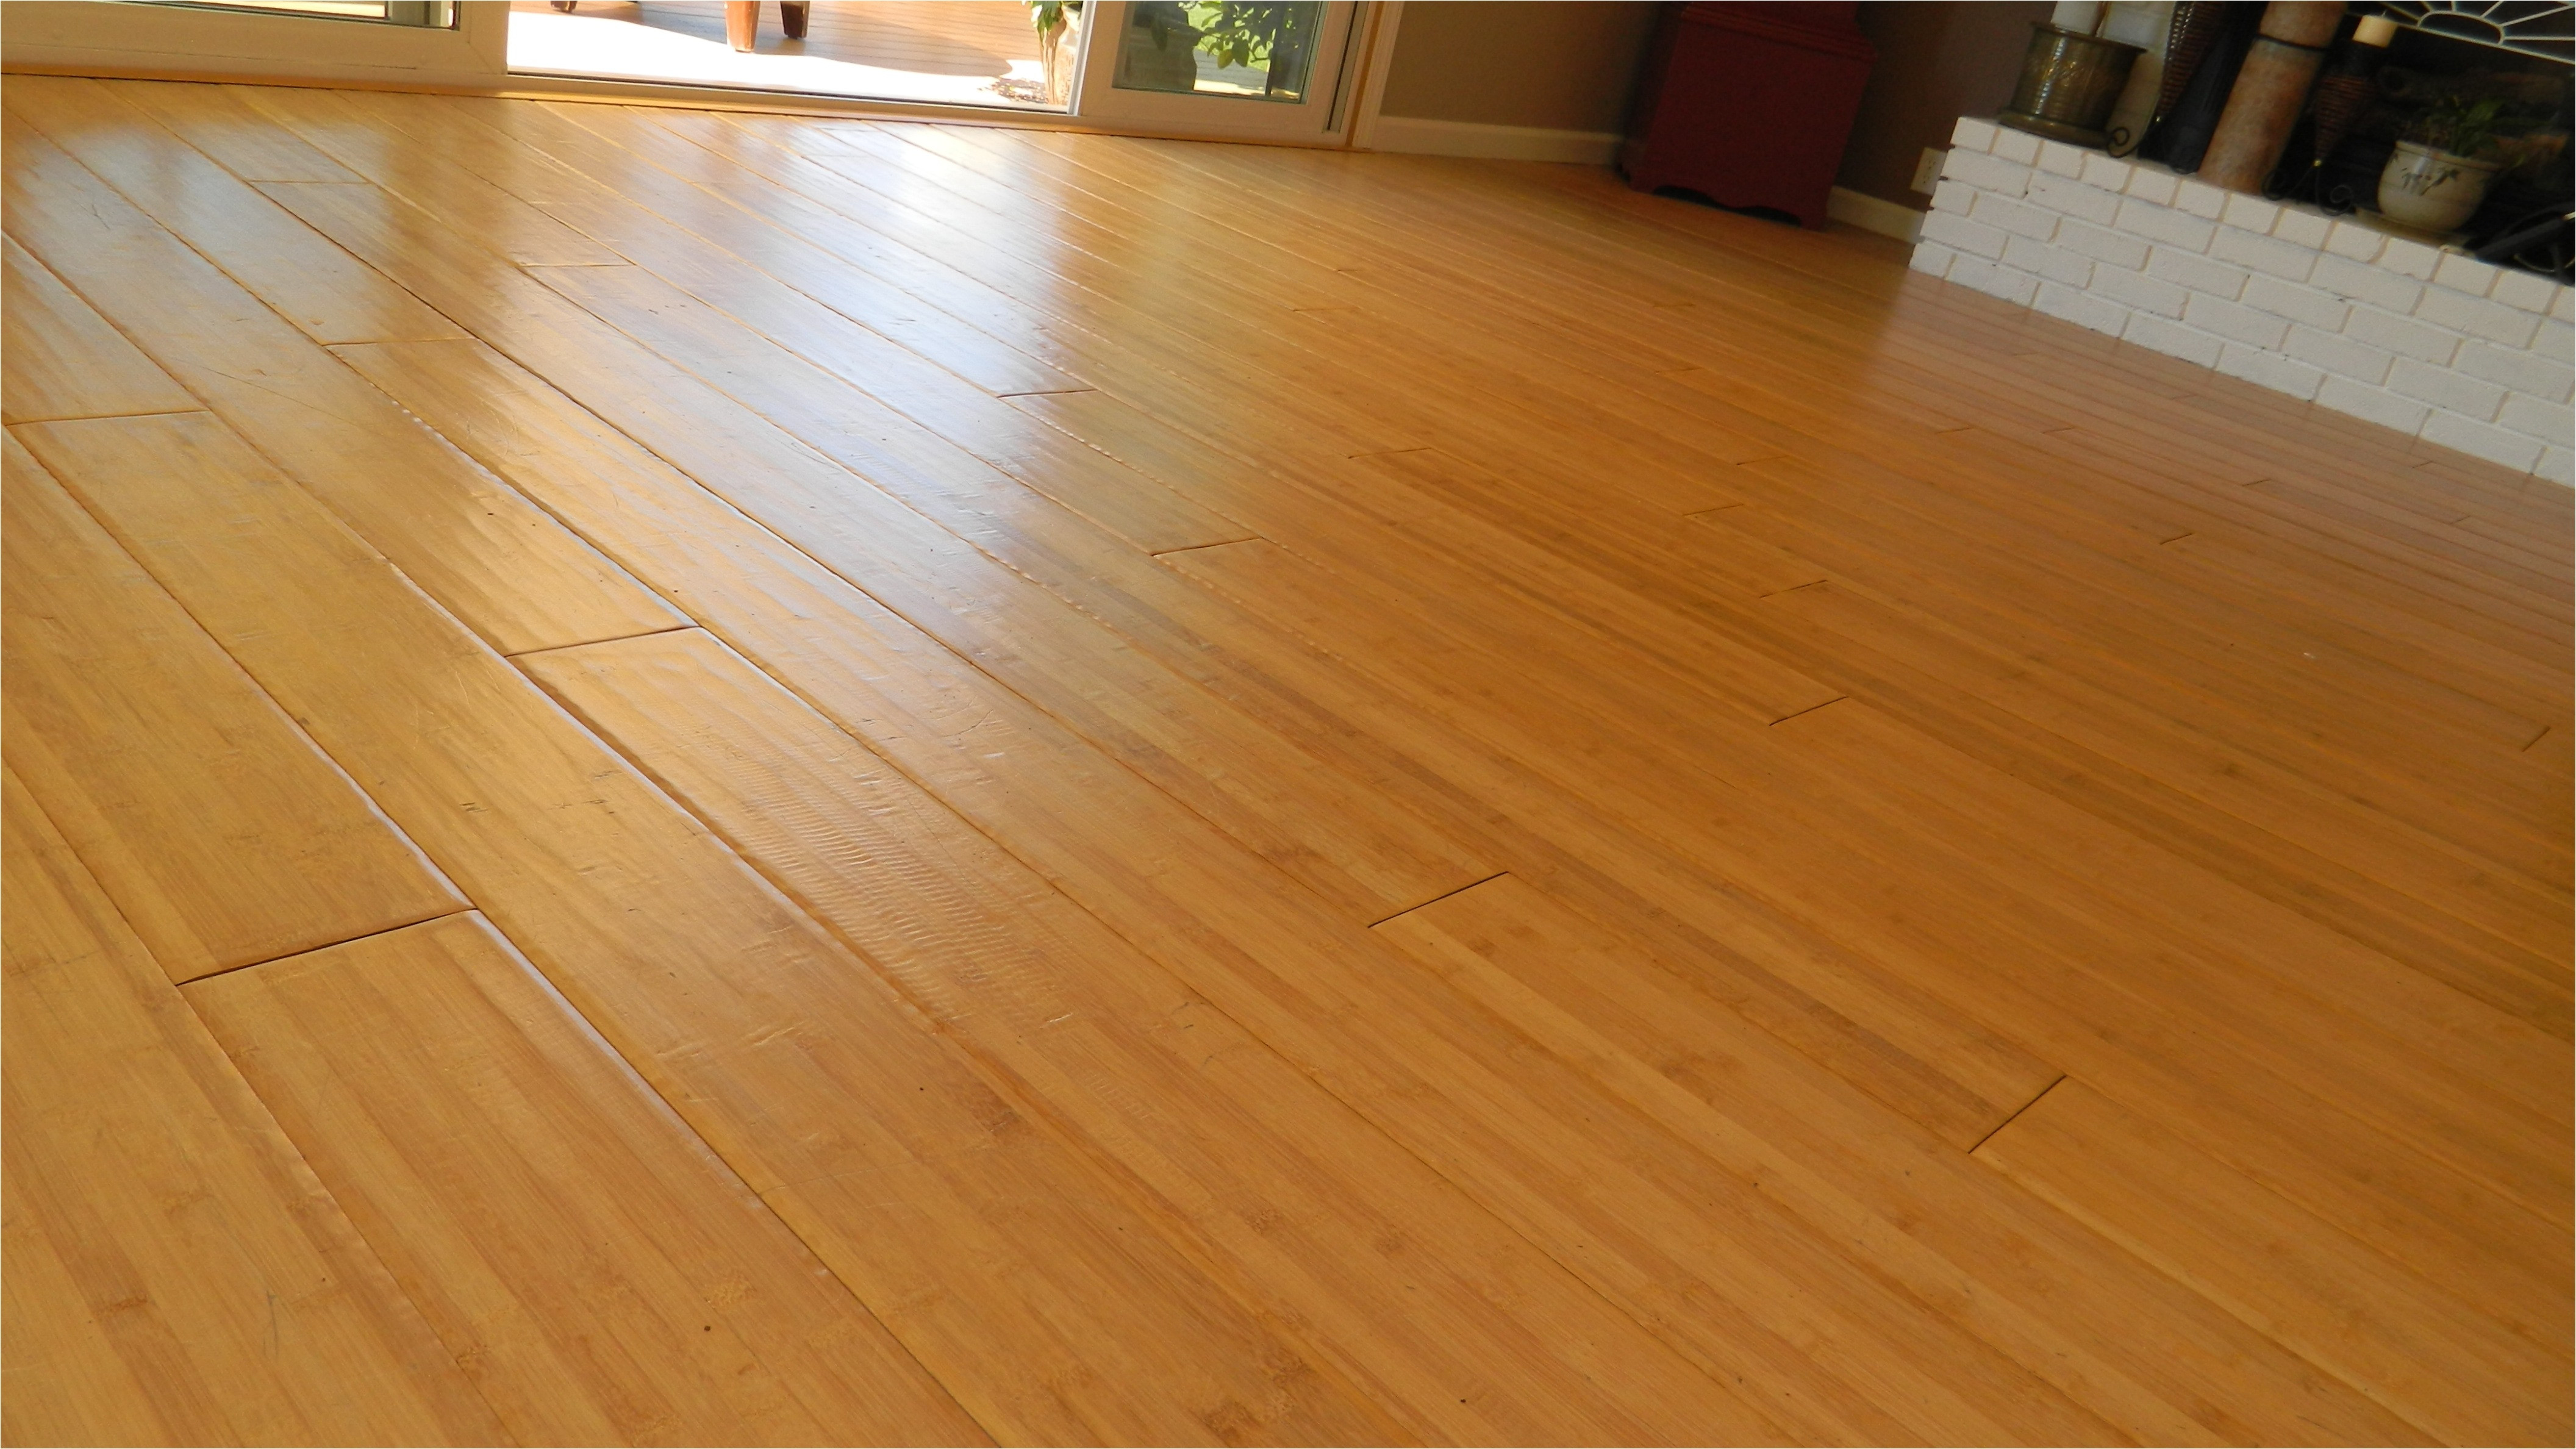 15 Fashionable Dust Mops For Hardwood Floors Unique